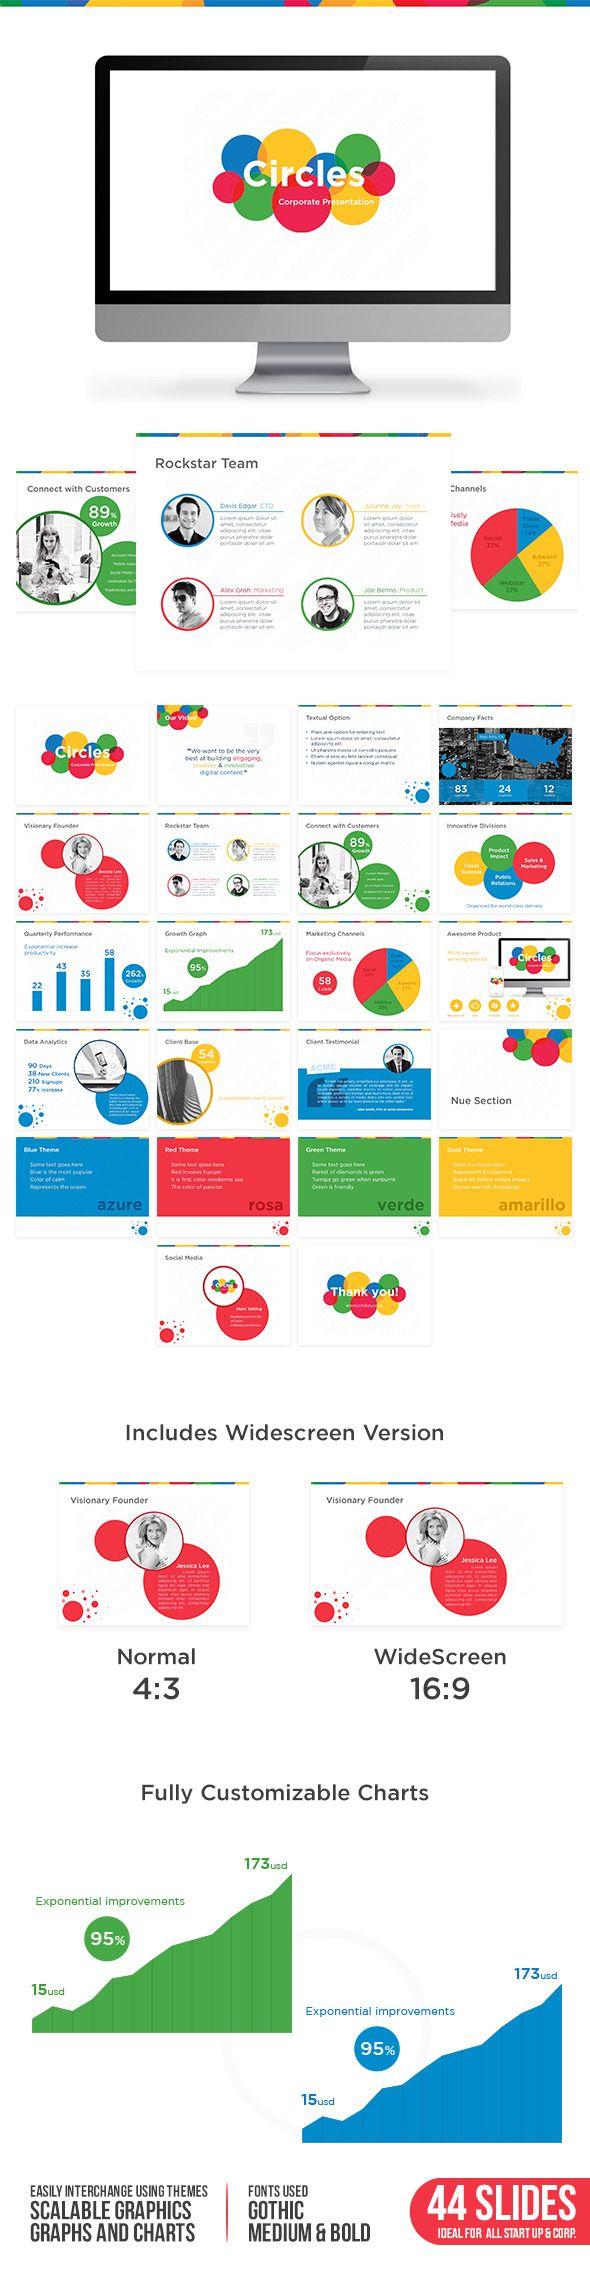 Circles PowerPoint Presentation Template #design #slides Download: http://graphicriver.net/item/circles-presentation-theme/13003449?ref=ksioks